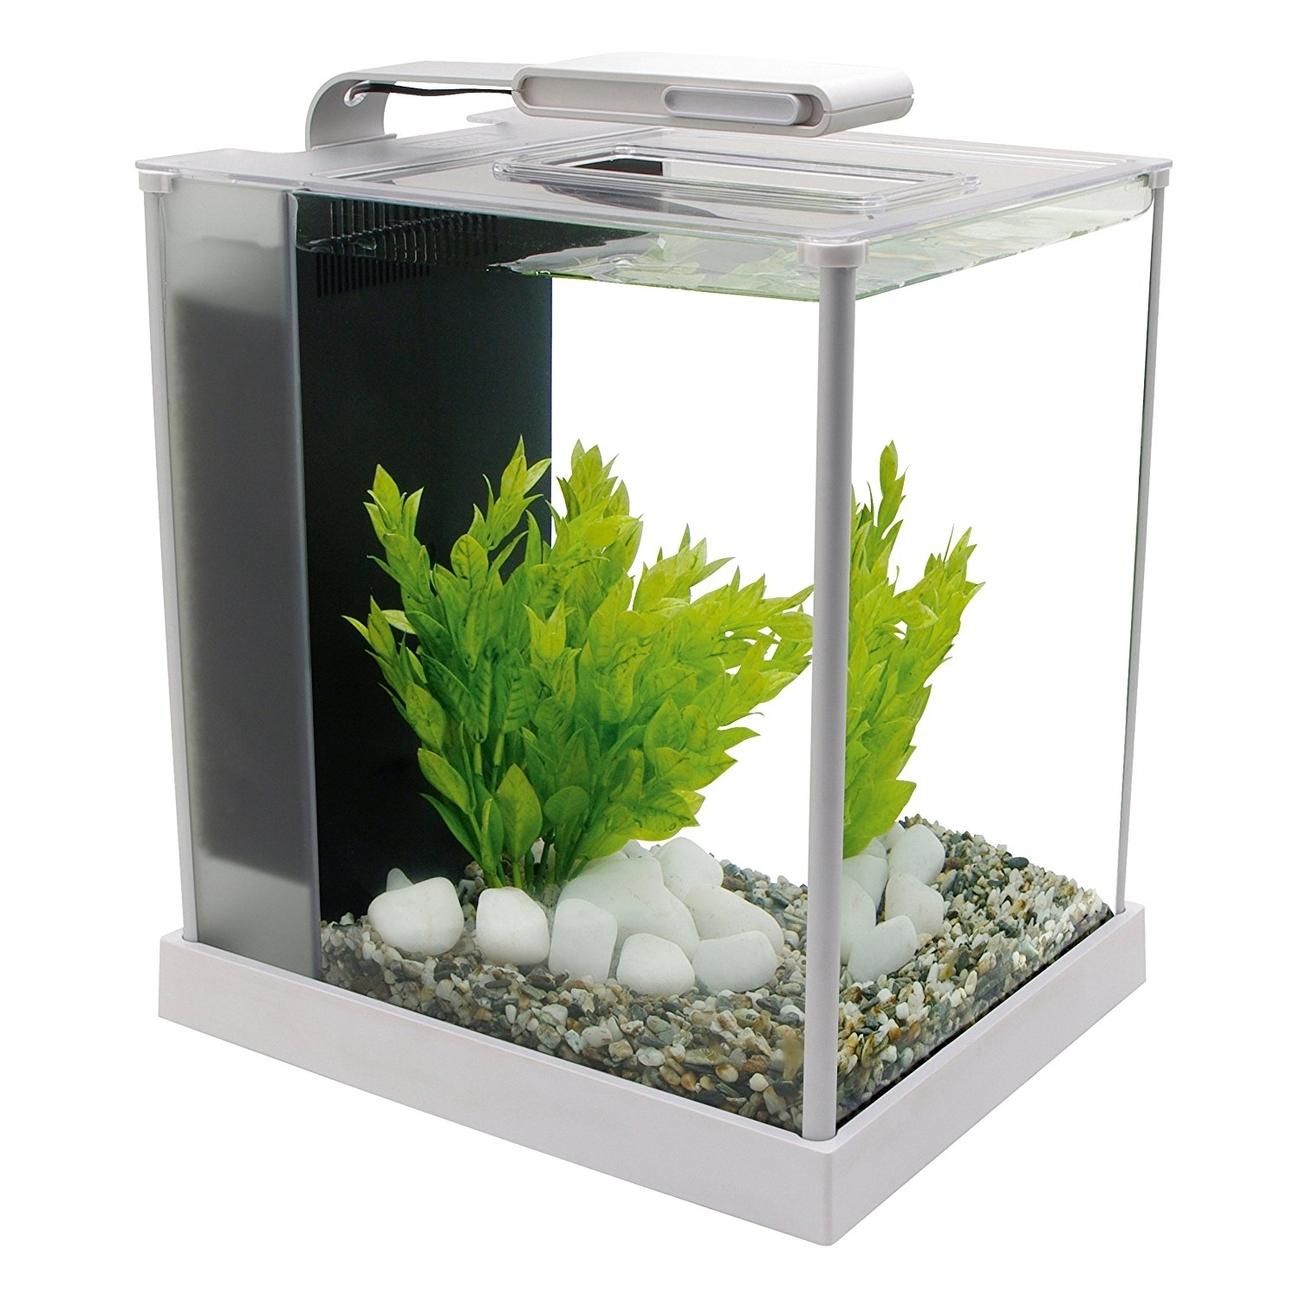 fluval spec s wasser aquarium set von fluval g nstig bestellen. Black Bedroom Furniture Sets. Home Design Ideas